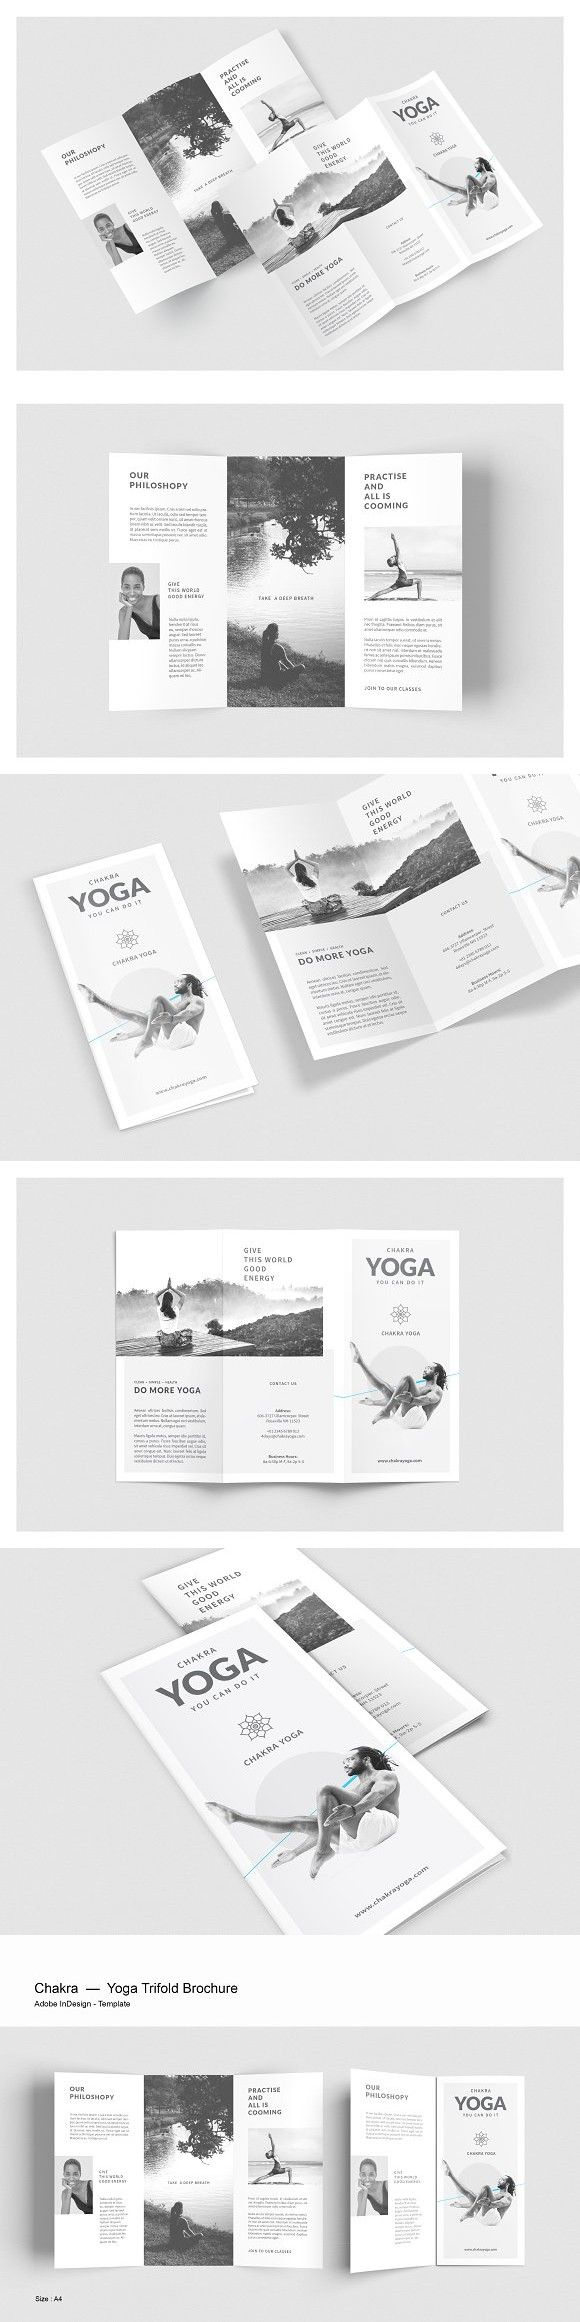 yoga trifold brochure yoga design pinterest brochure design